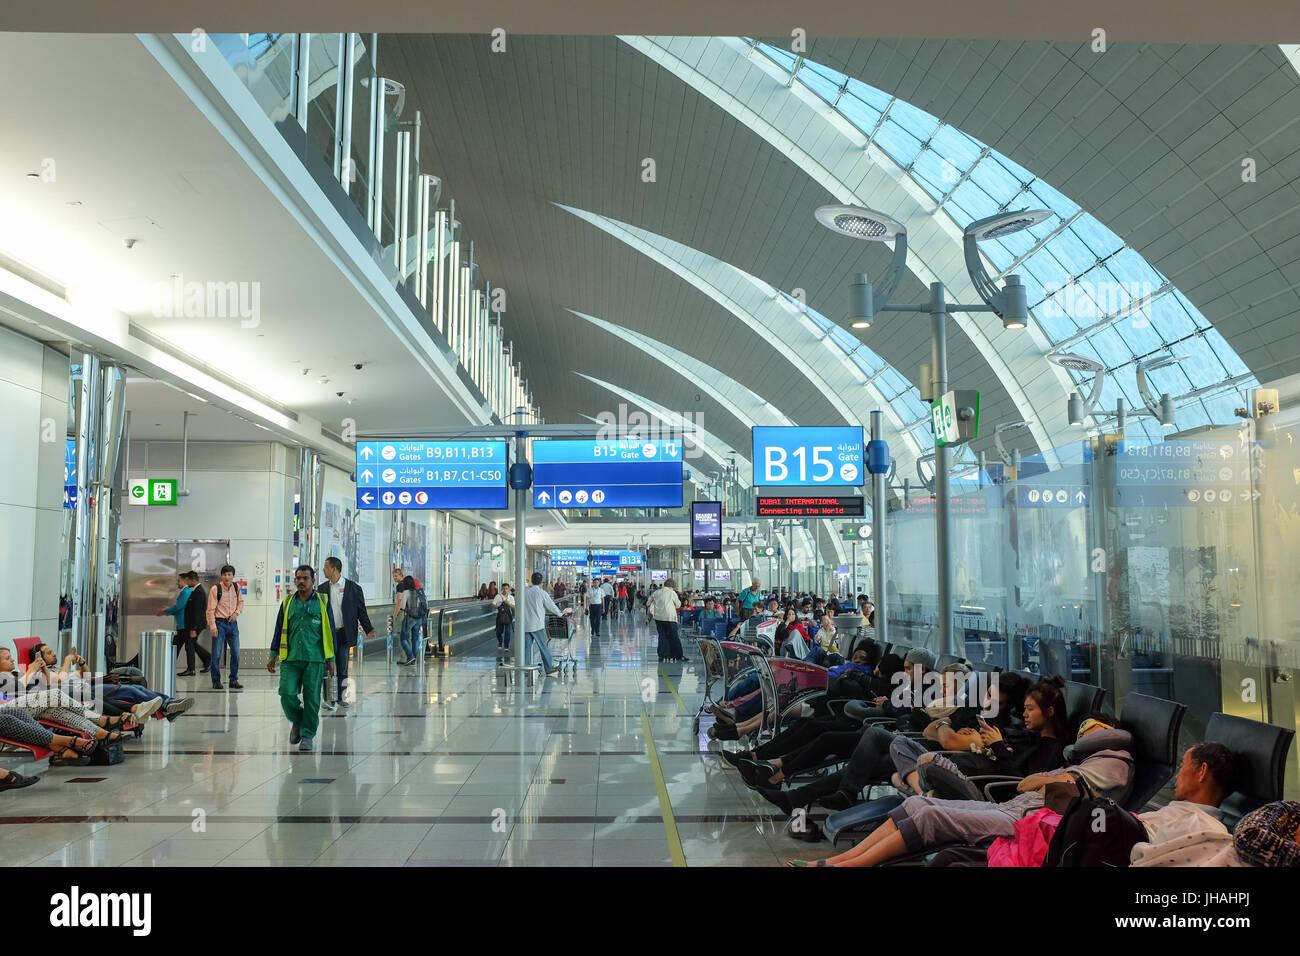 Dubai airport departure lounges. - Stock Image